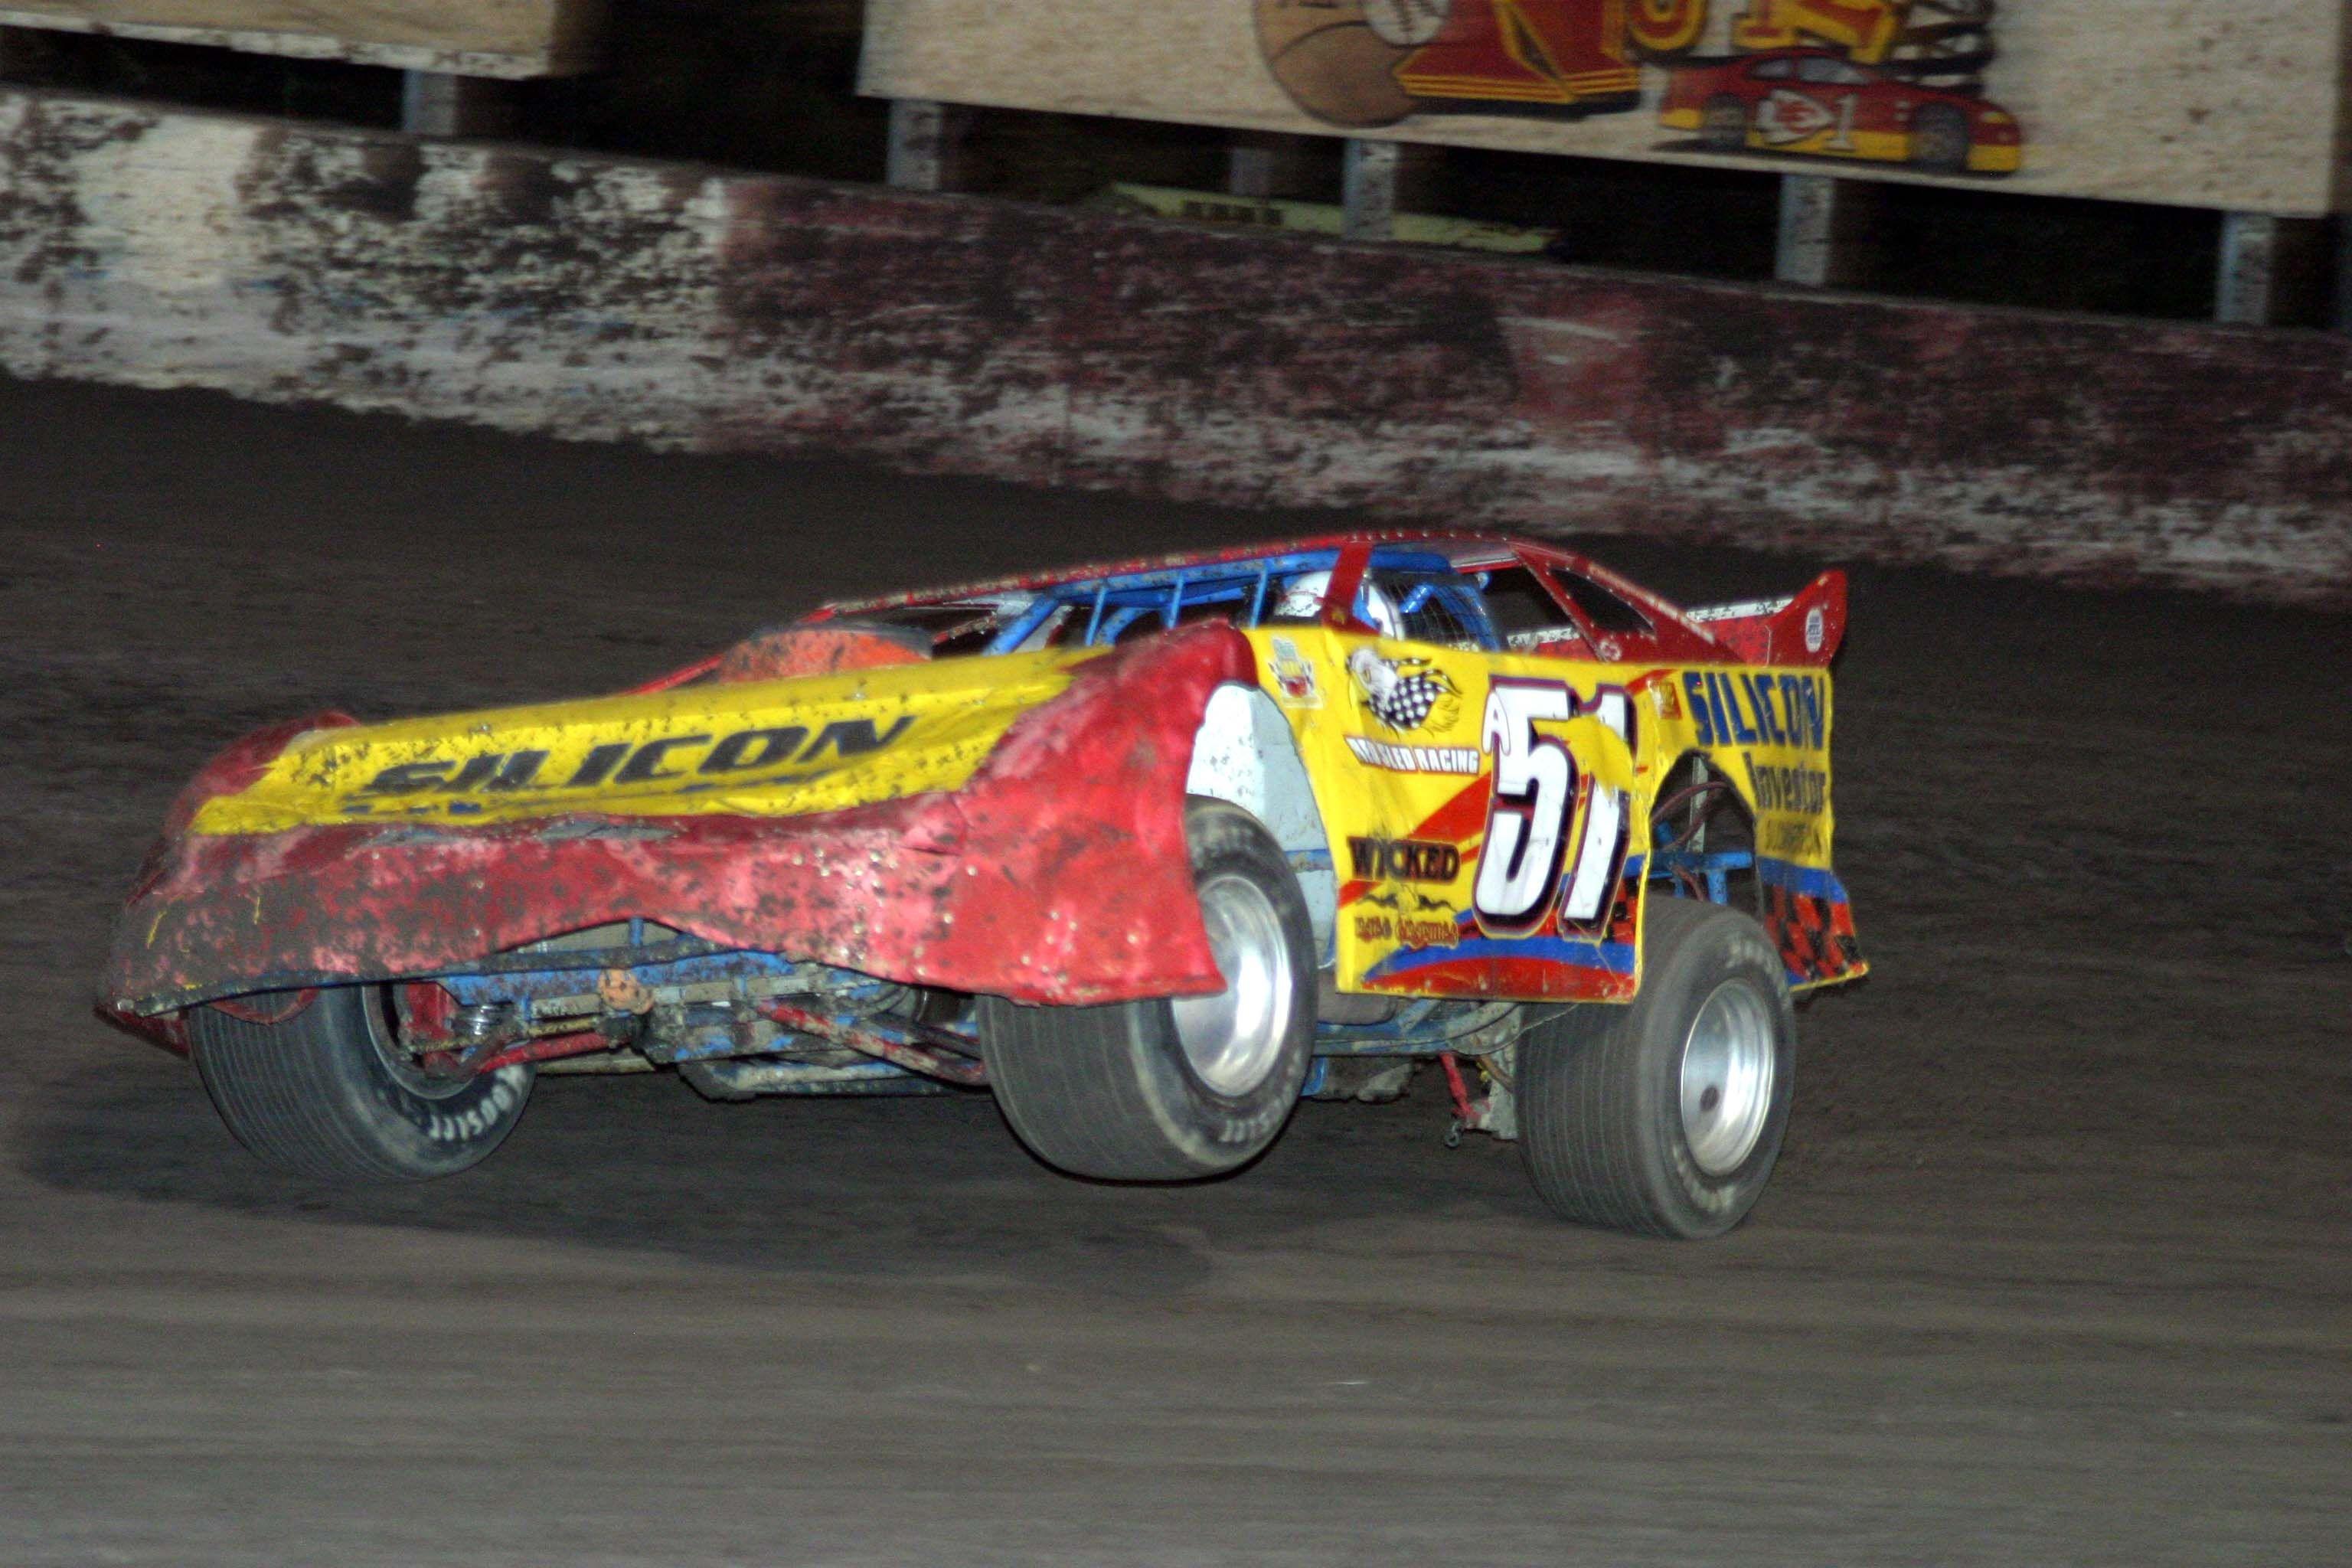 Mlra Dirt Late Model 3 Wheel Action Dirt Late Models Dirt Late Model Racing Late Model Racing